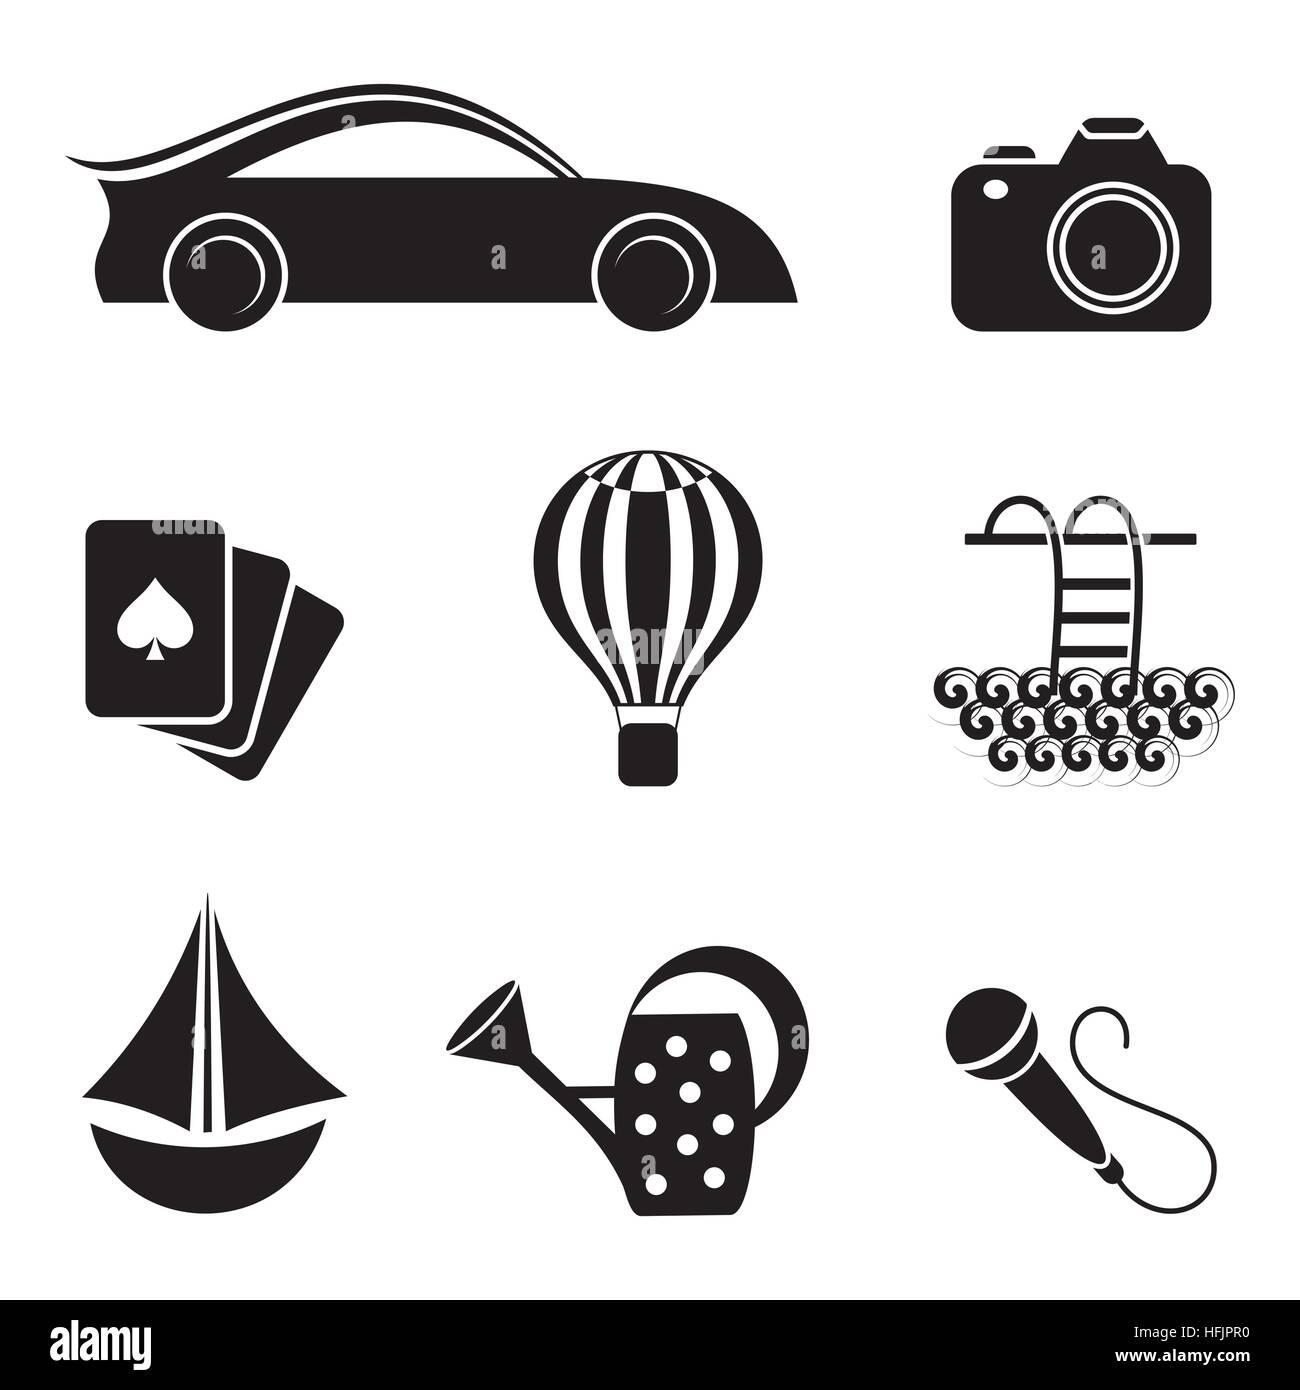 Hobby Interests Stock Illustrations – 176 Hobby Interests Stock  Illustrations, Vectors & Clipart - Dreamstime